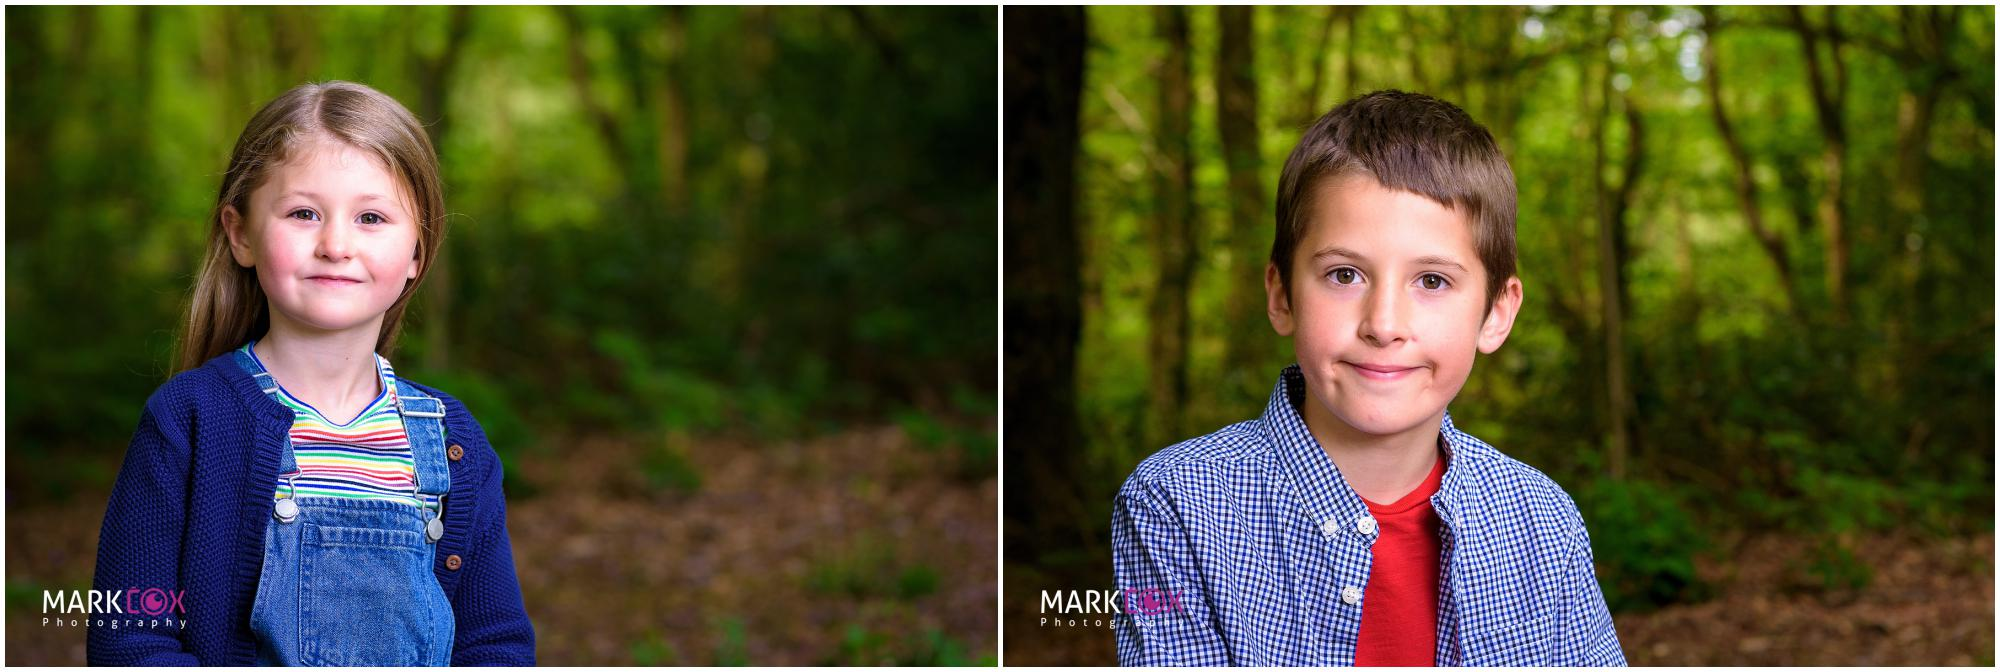 Outdoor Family Portraits - Taunton Portrait Photographer -005